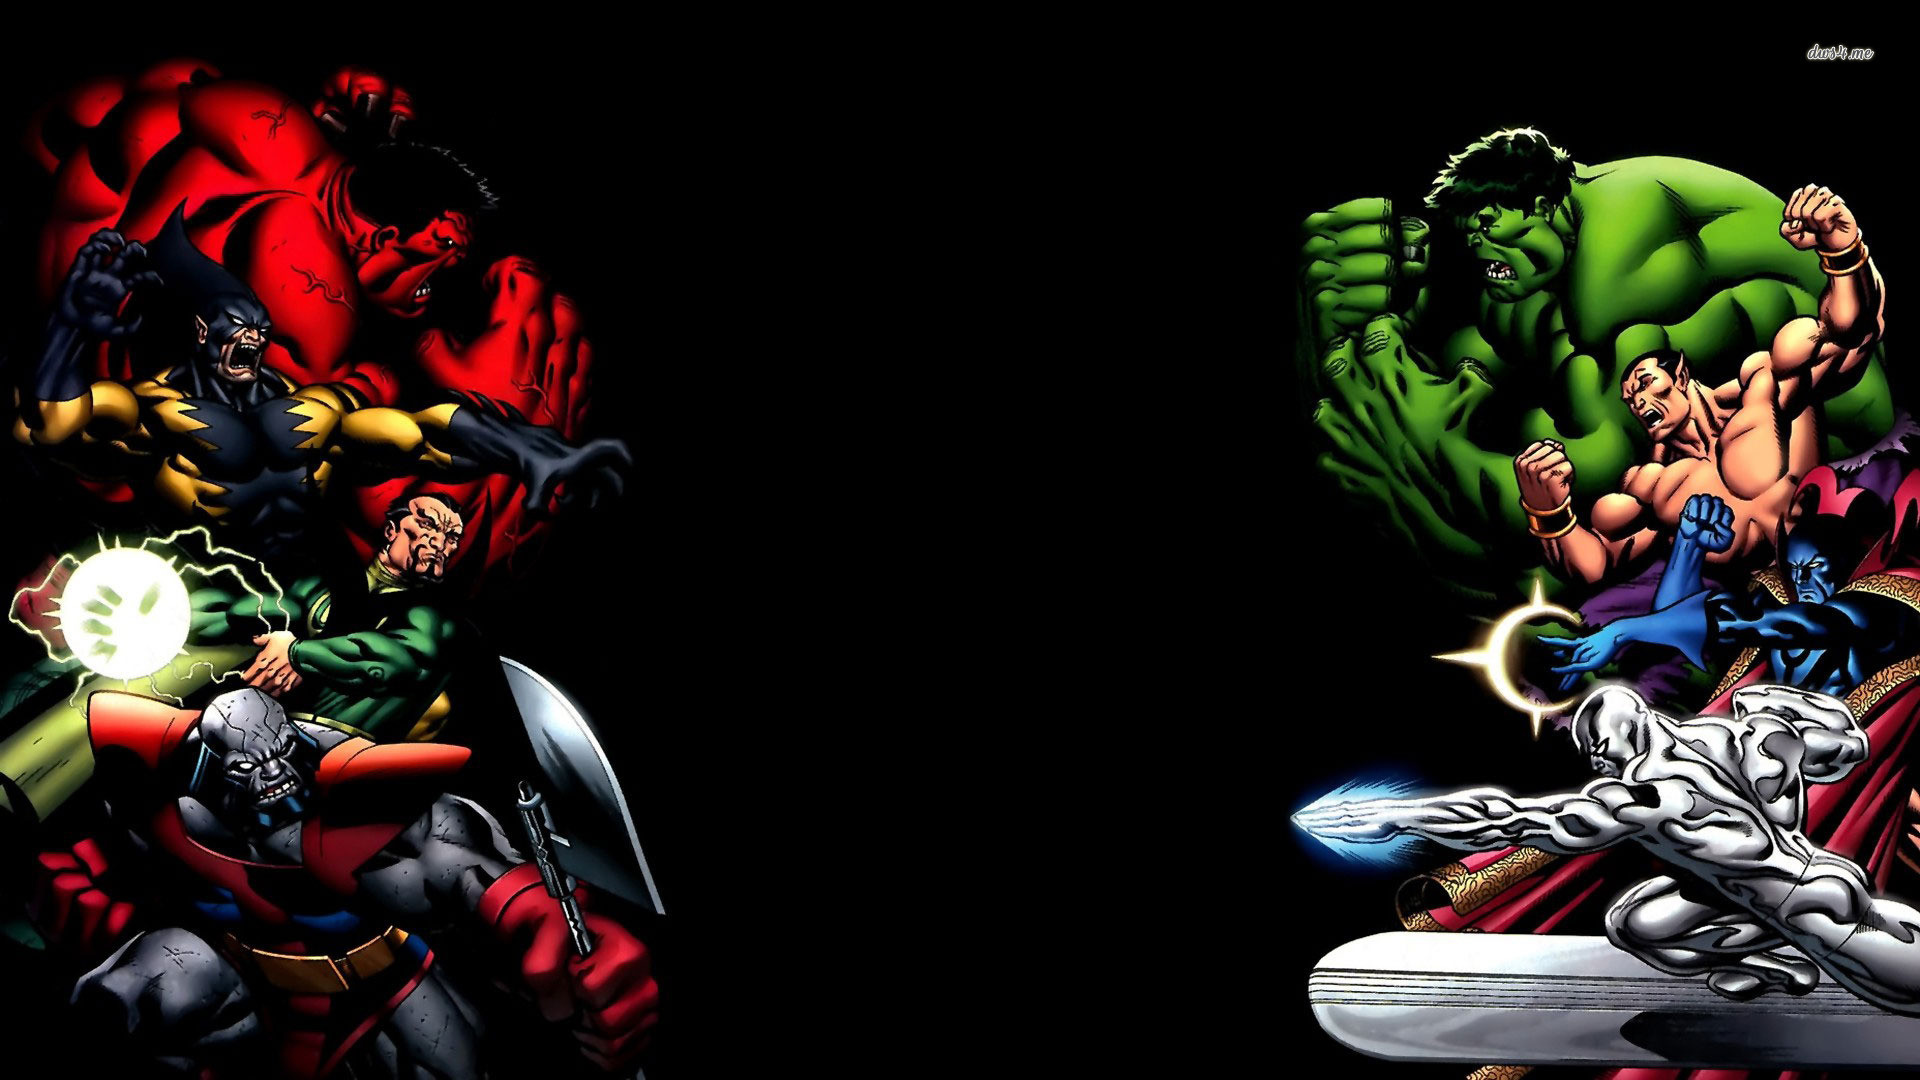 Marvel villains wallpaper wallpapertag - Marvel and dc wallpapers ...